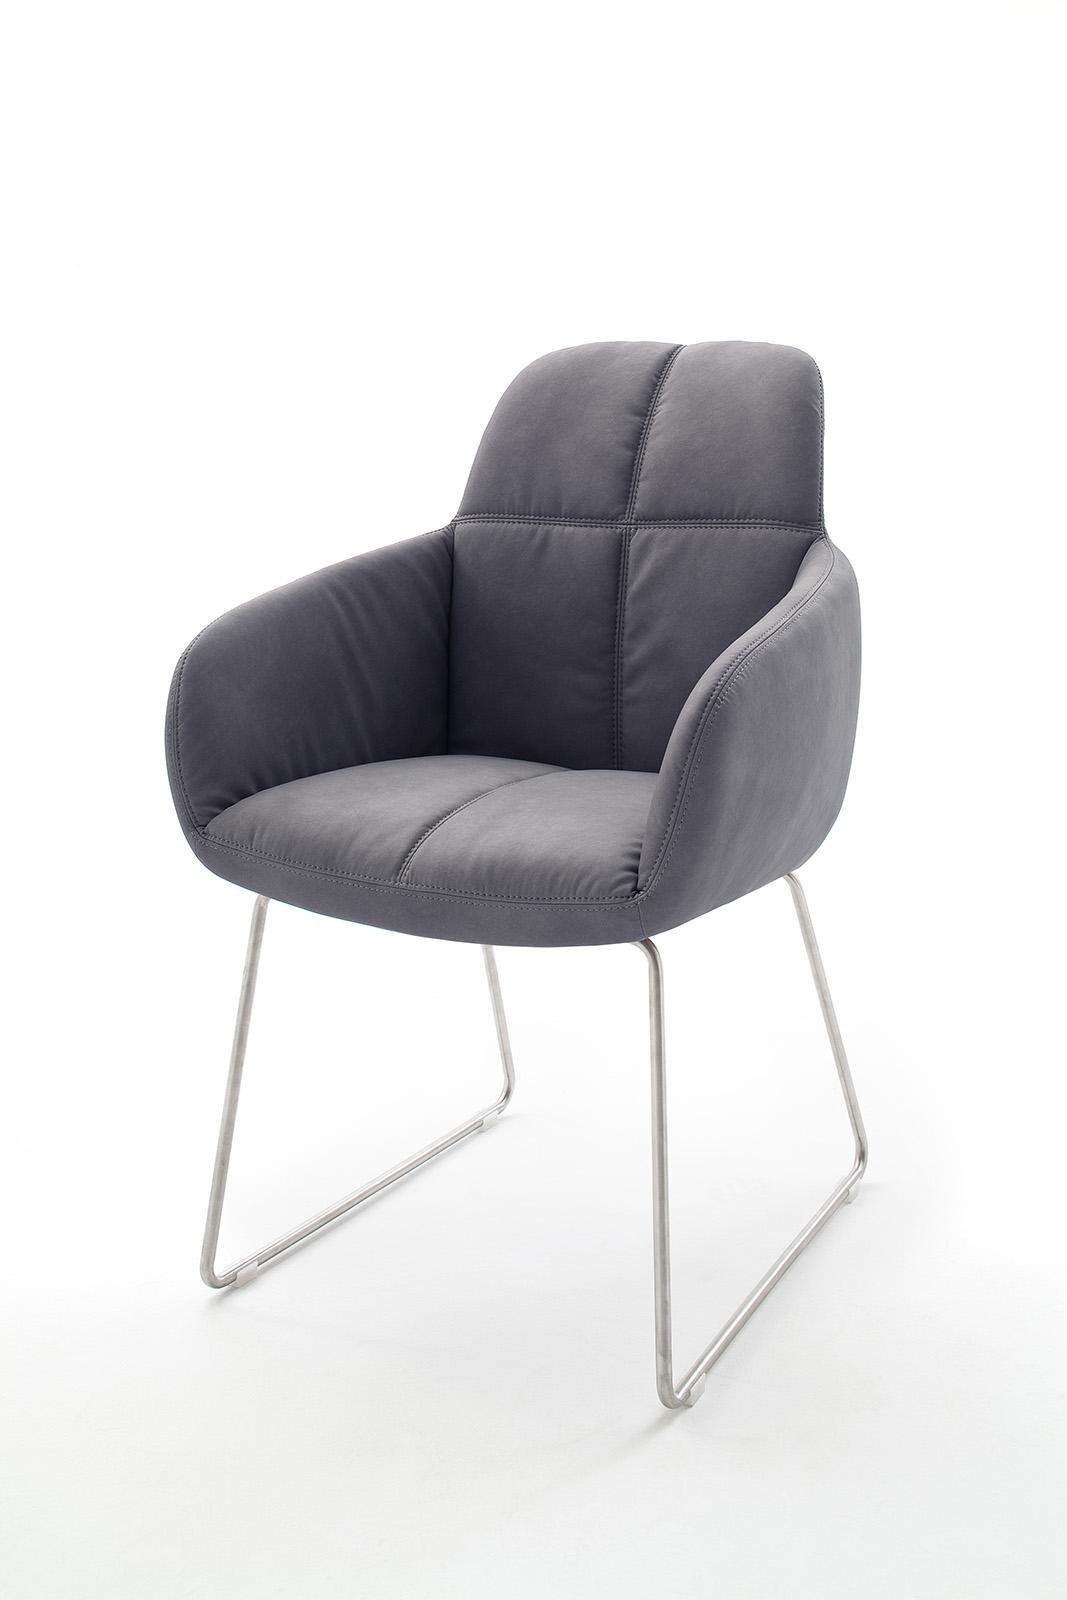 stuhl hellgrau beautiful retro stuhl gteborg graueiche. Black Bedroom Furniture Sets. Home Design Ideas